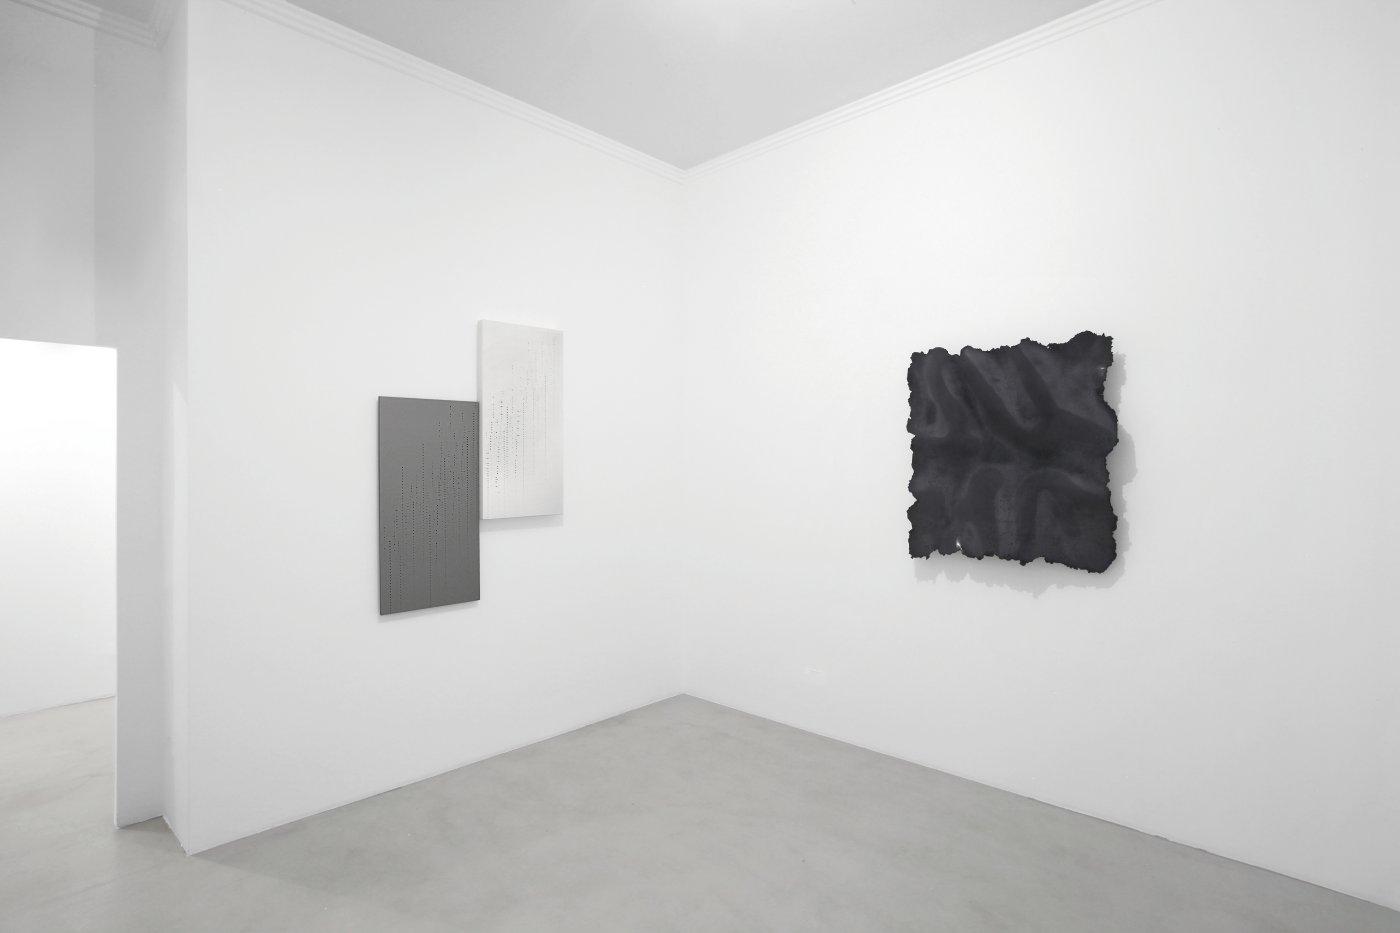 A Arte Invernizzi Sensitive spaces 5